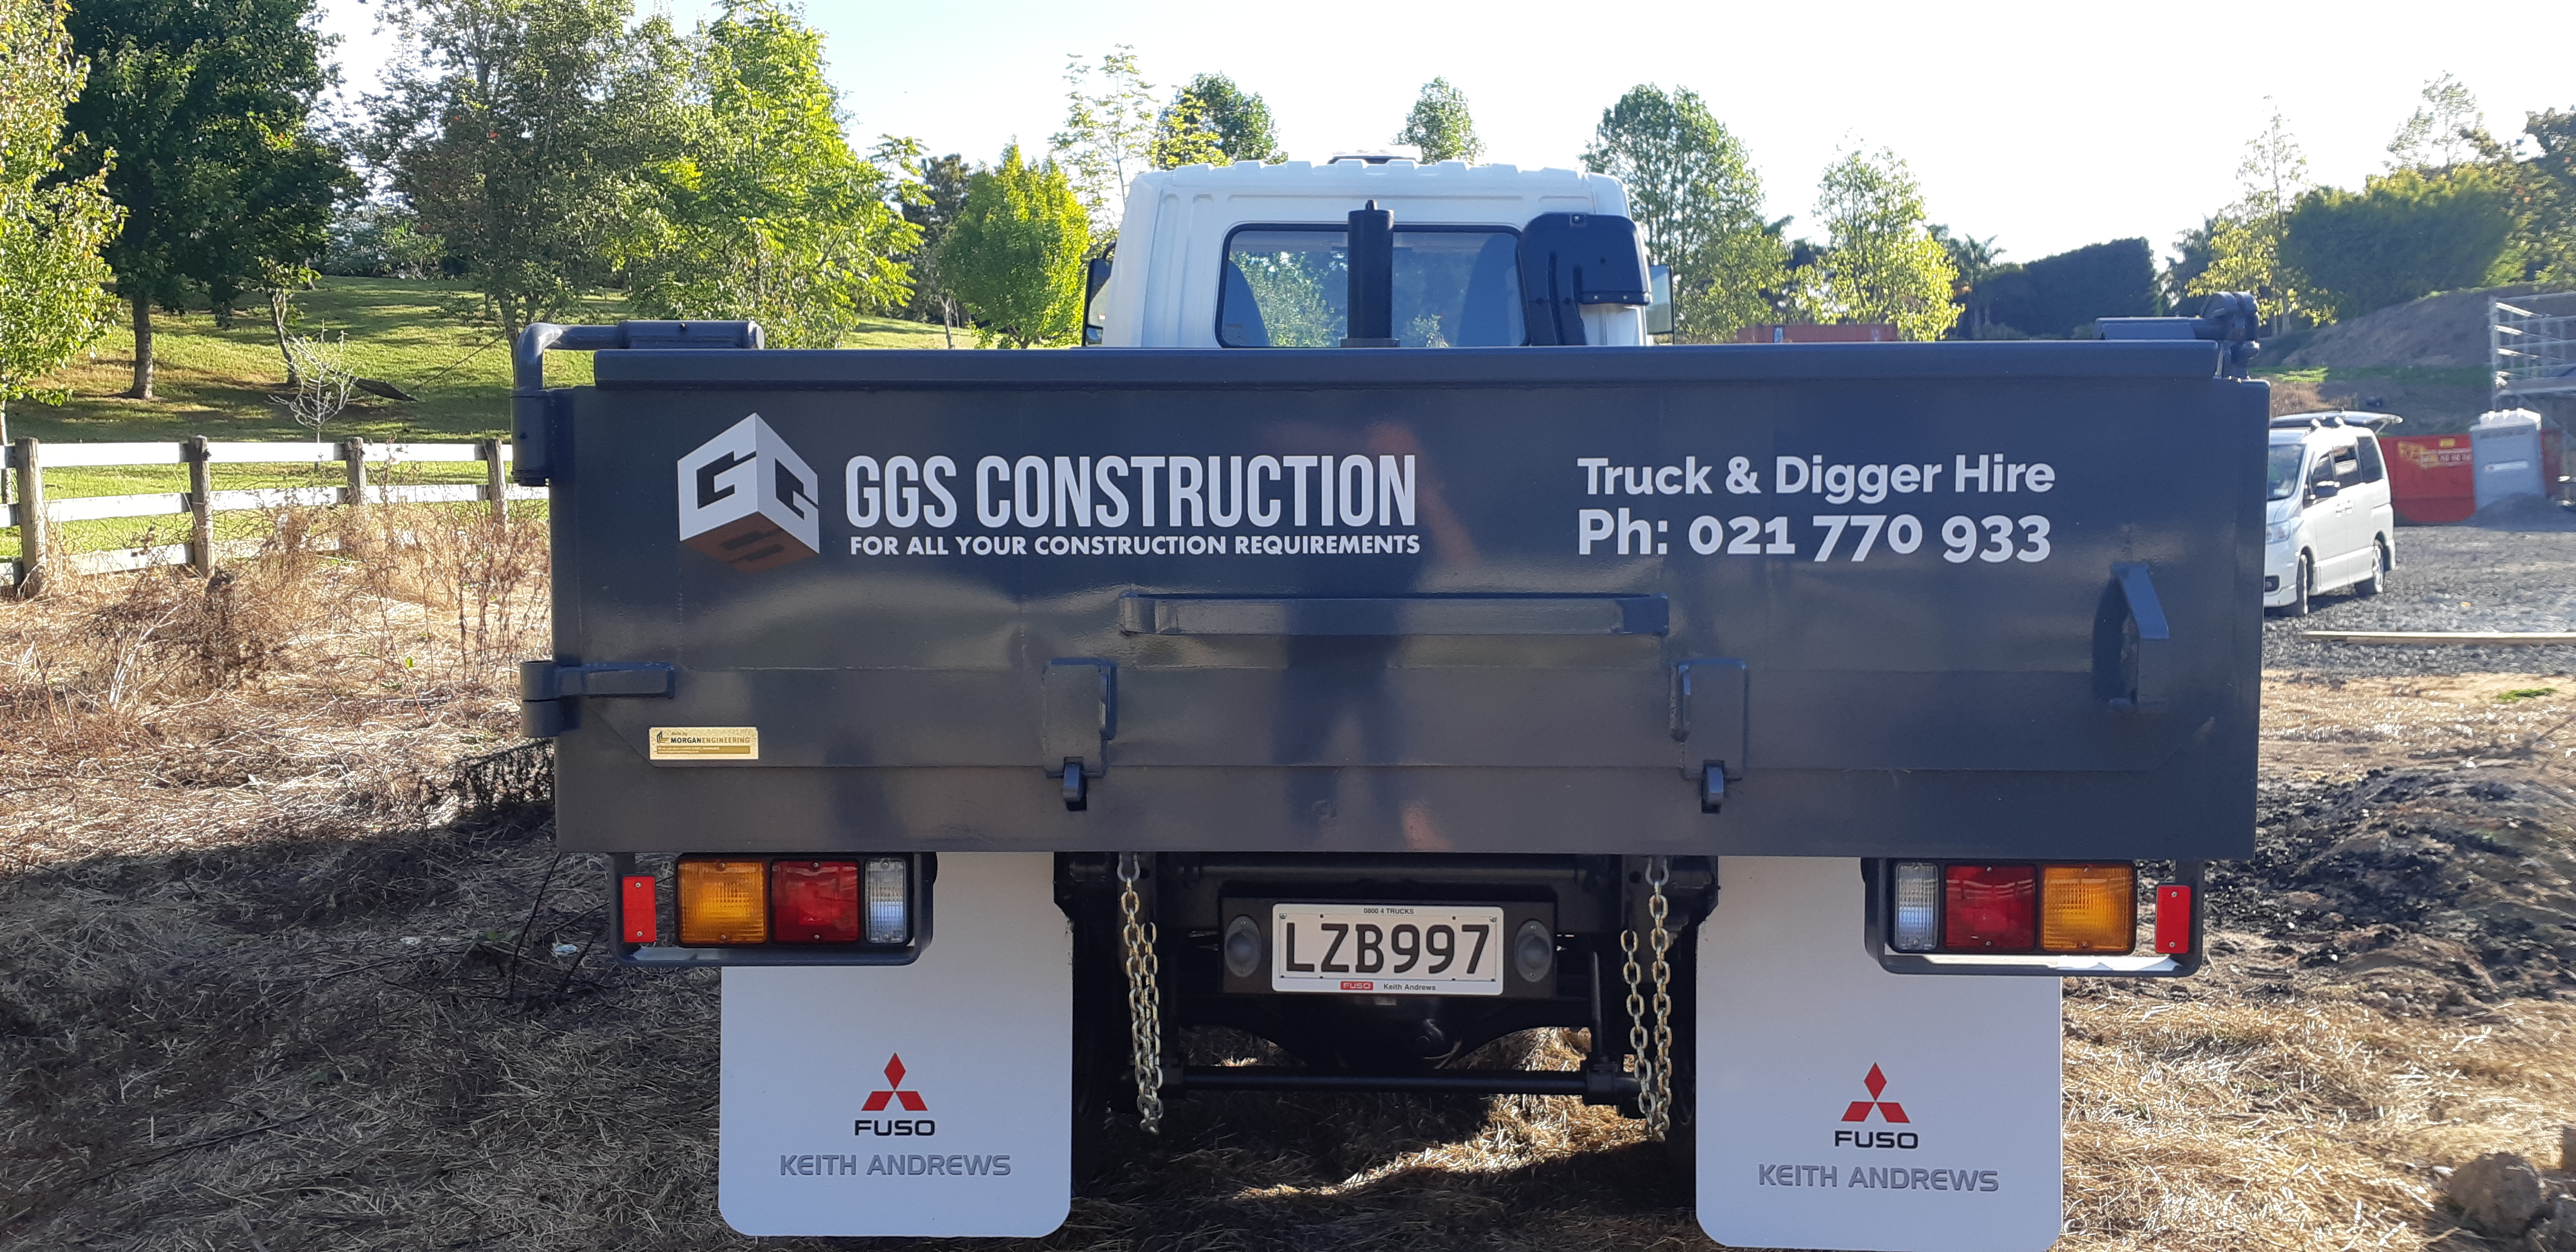 Truck Fleet Signage